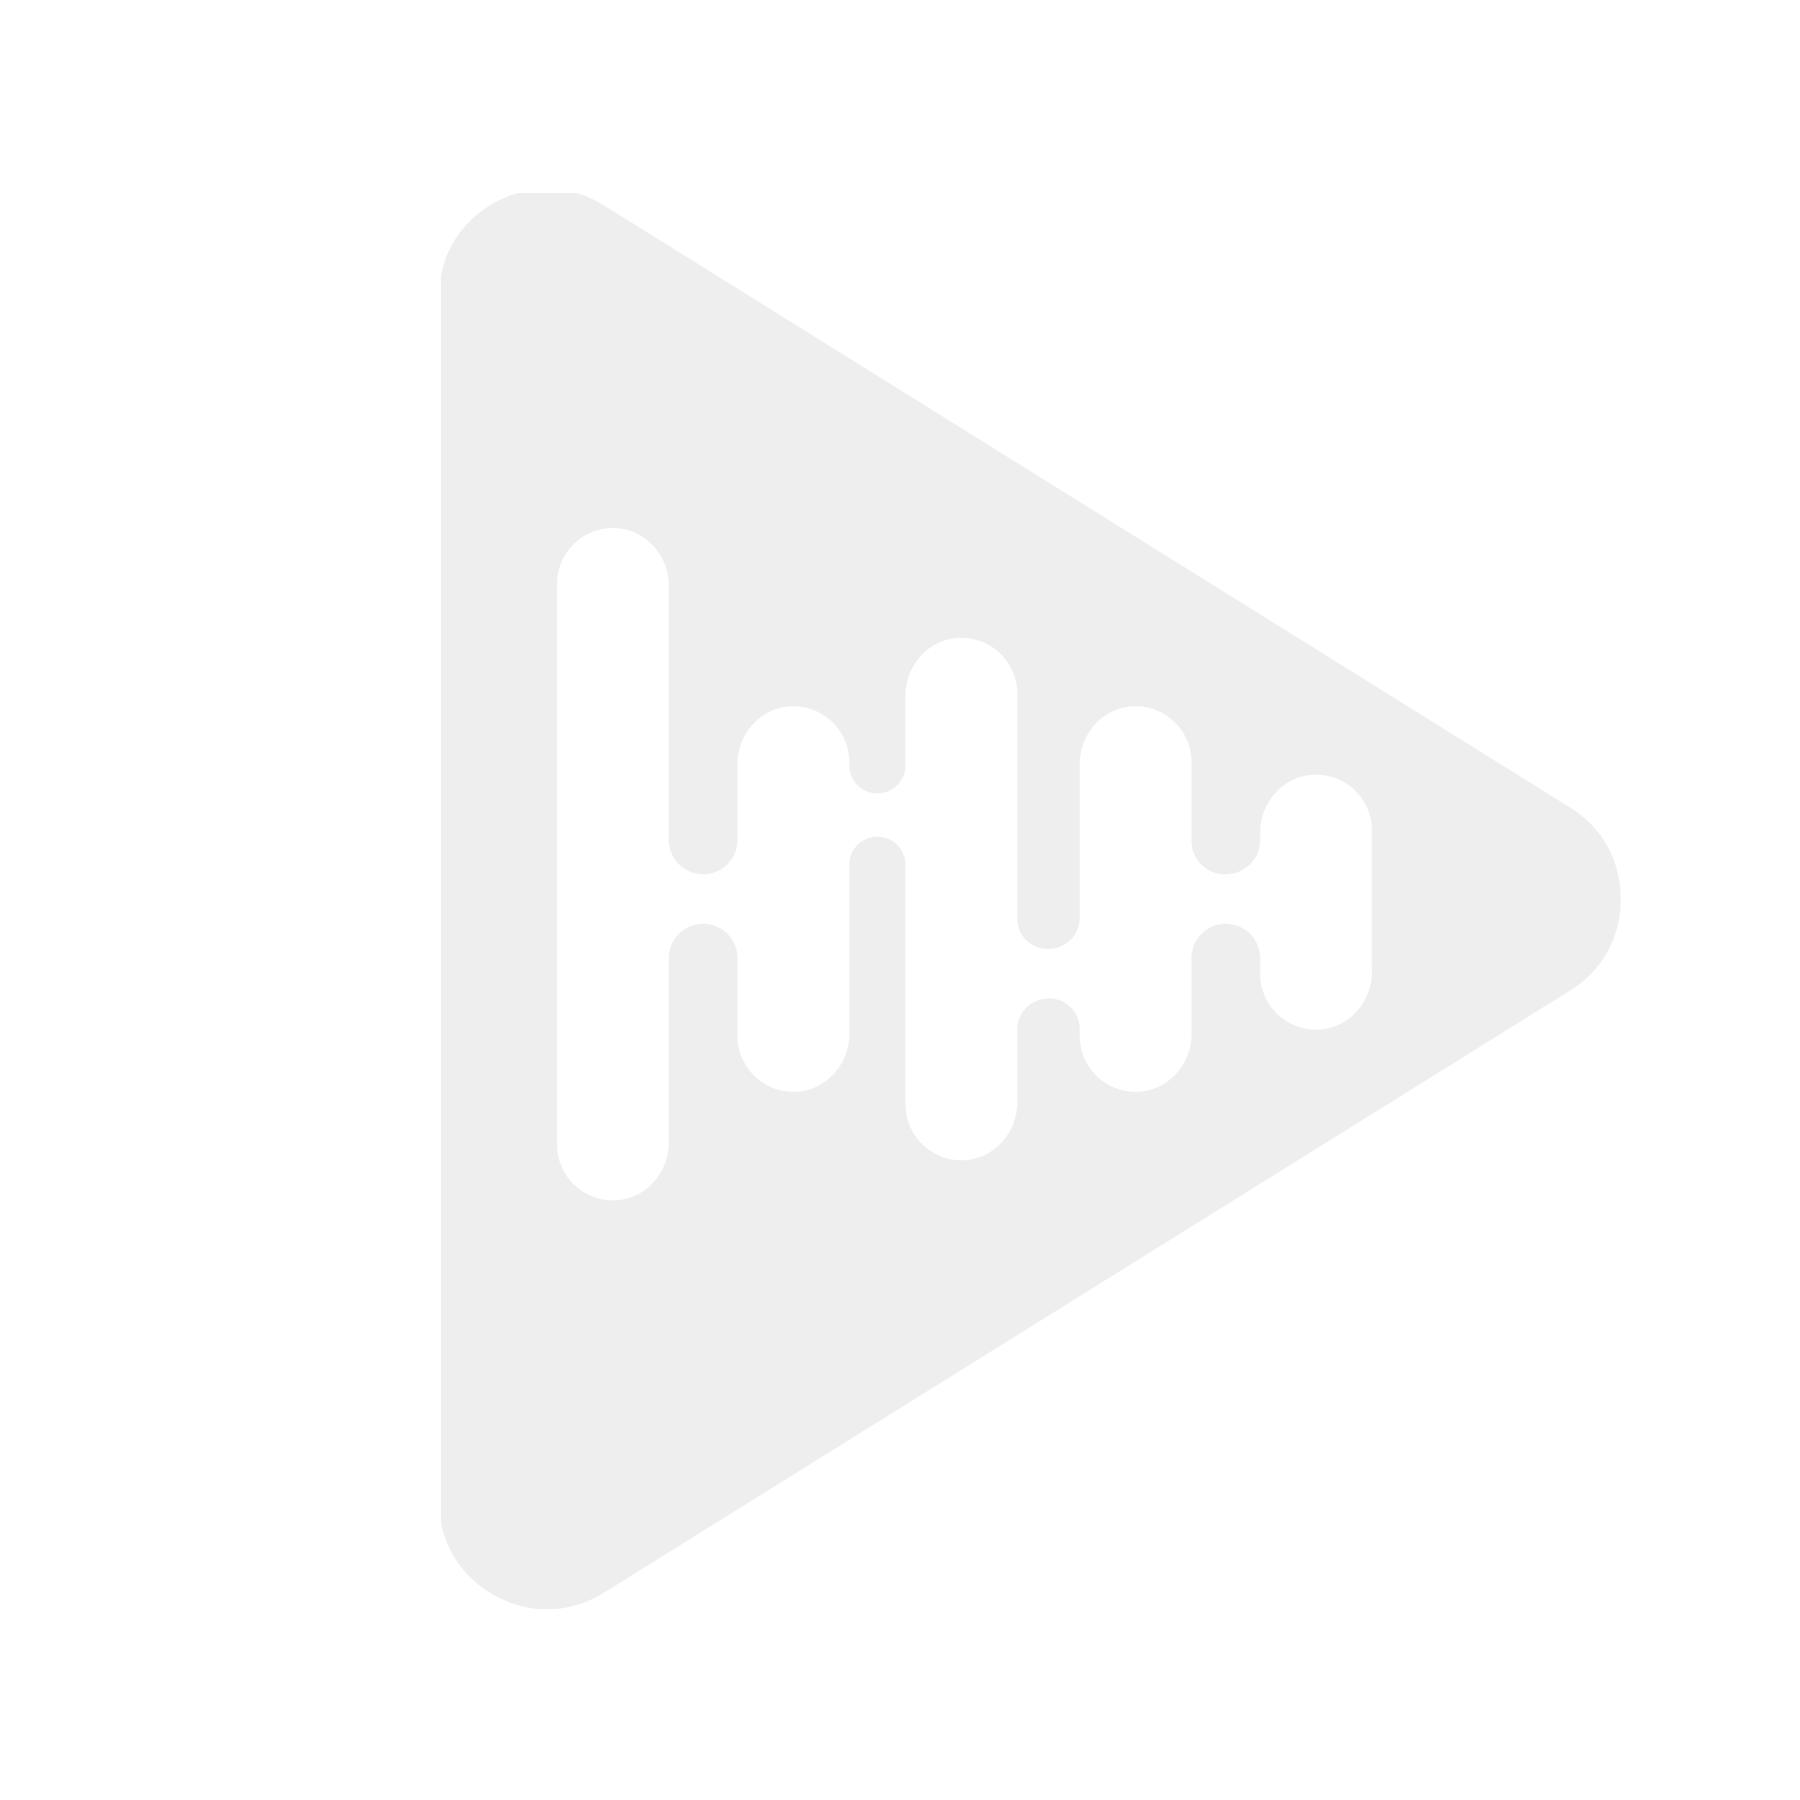 Beat-Sonic SSA01 - Info-adapter, Subaru Legacy, Outback ('03-'06) m/DVD navi